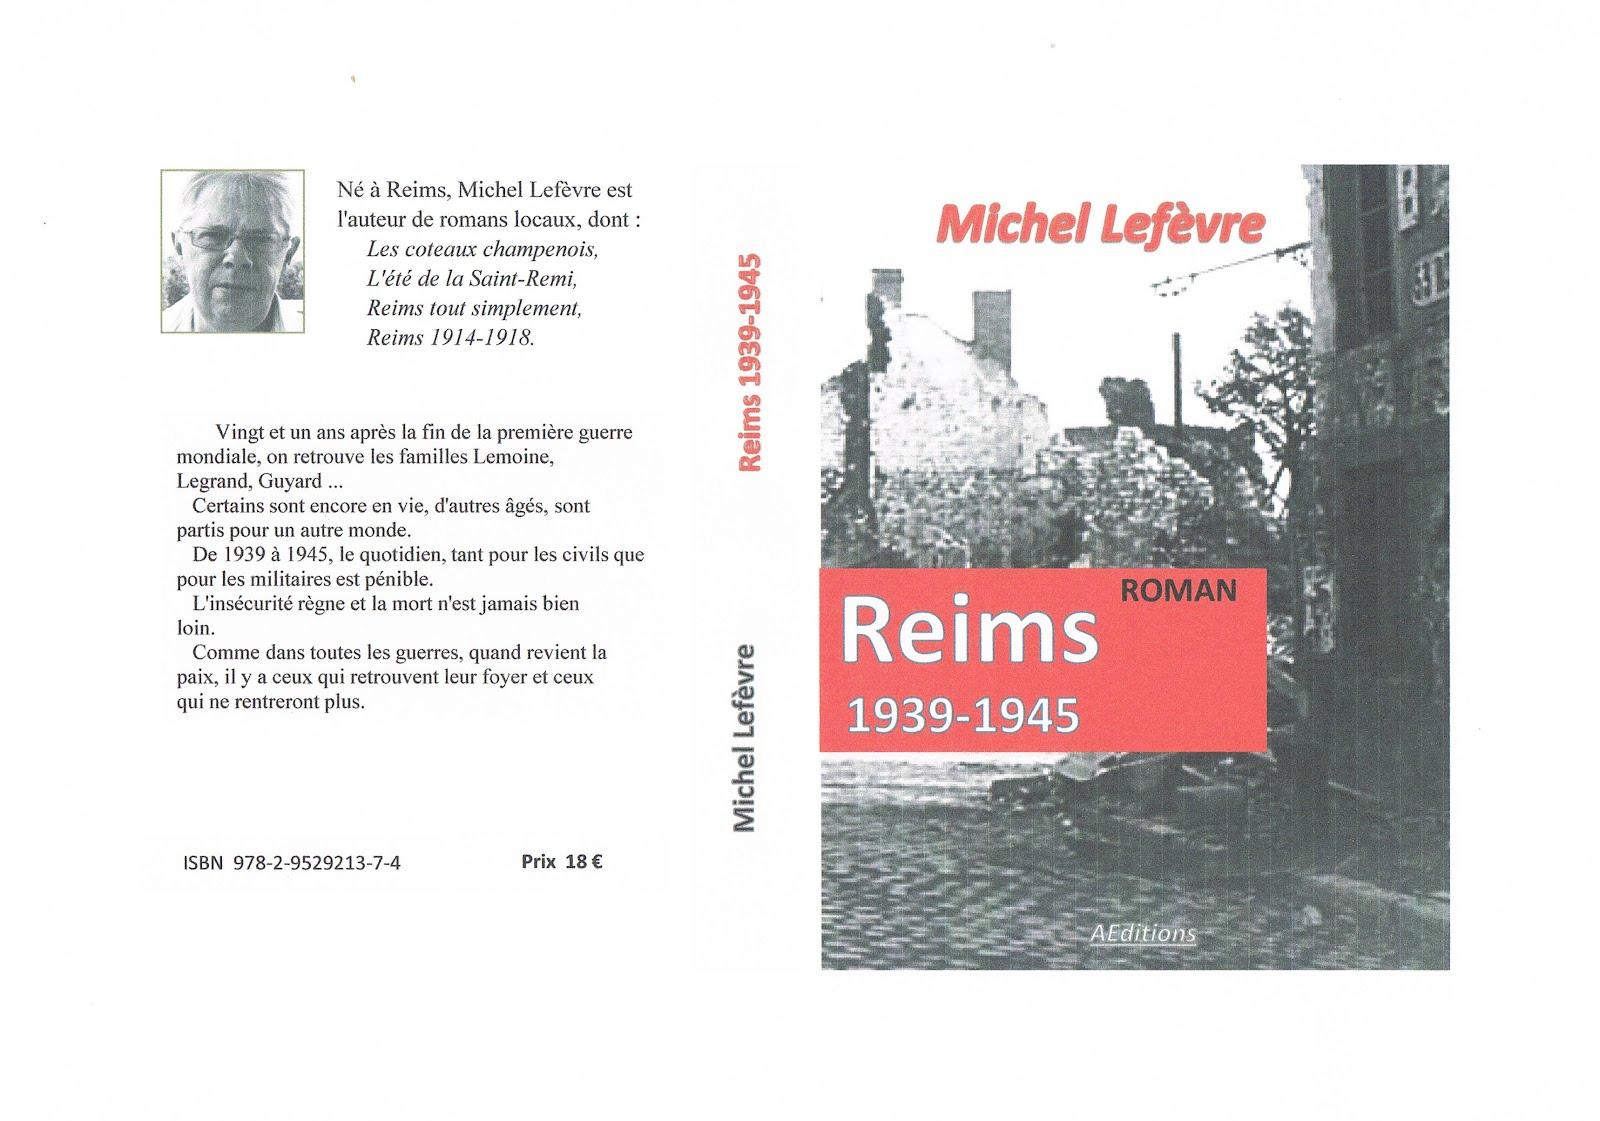 Aeditions reims 1939 1945 - Depot vente meubles reims ...